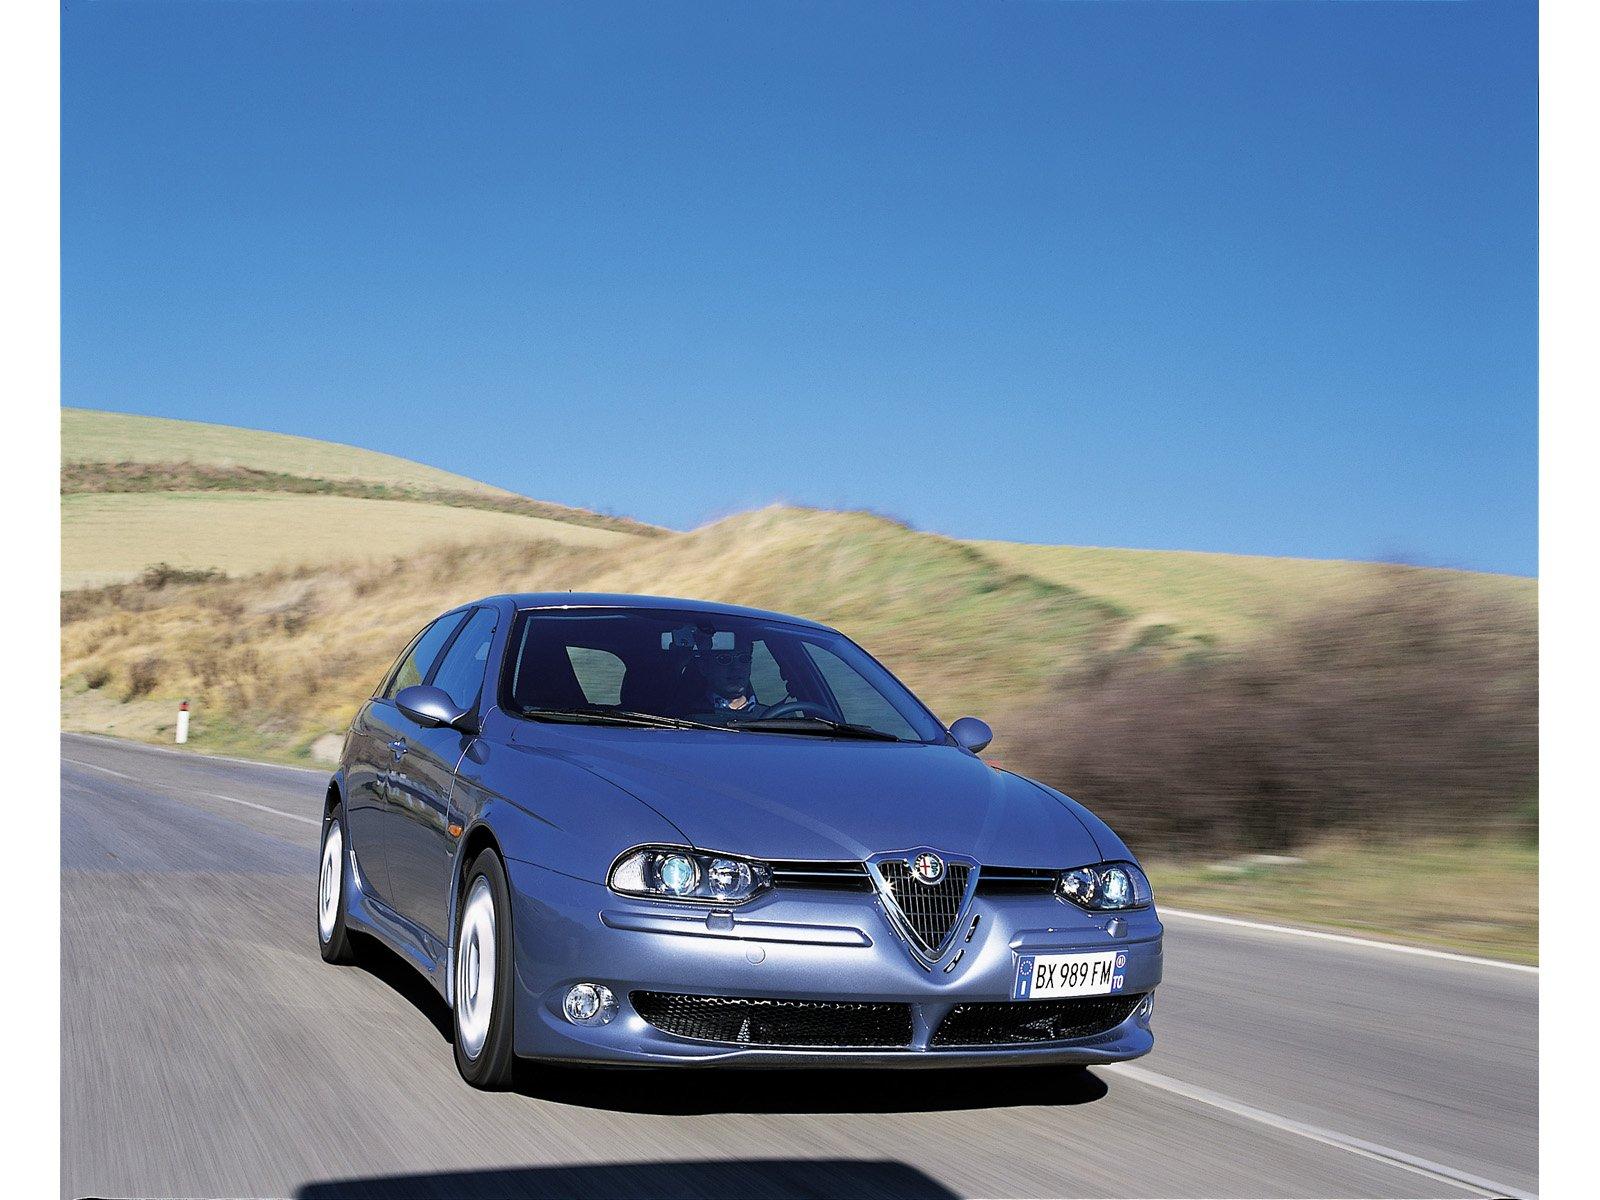 Alfa Romeo 156 Gta Picture 9168 Alfa Romeo Photo Gallery